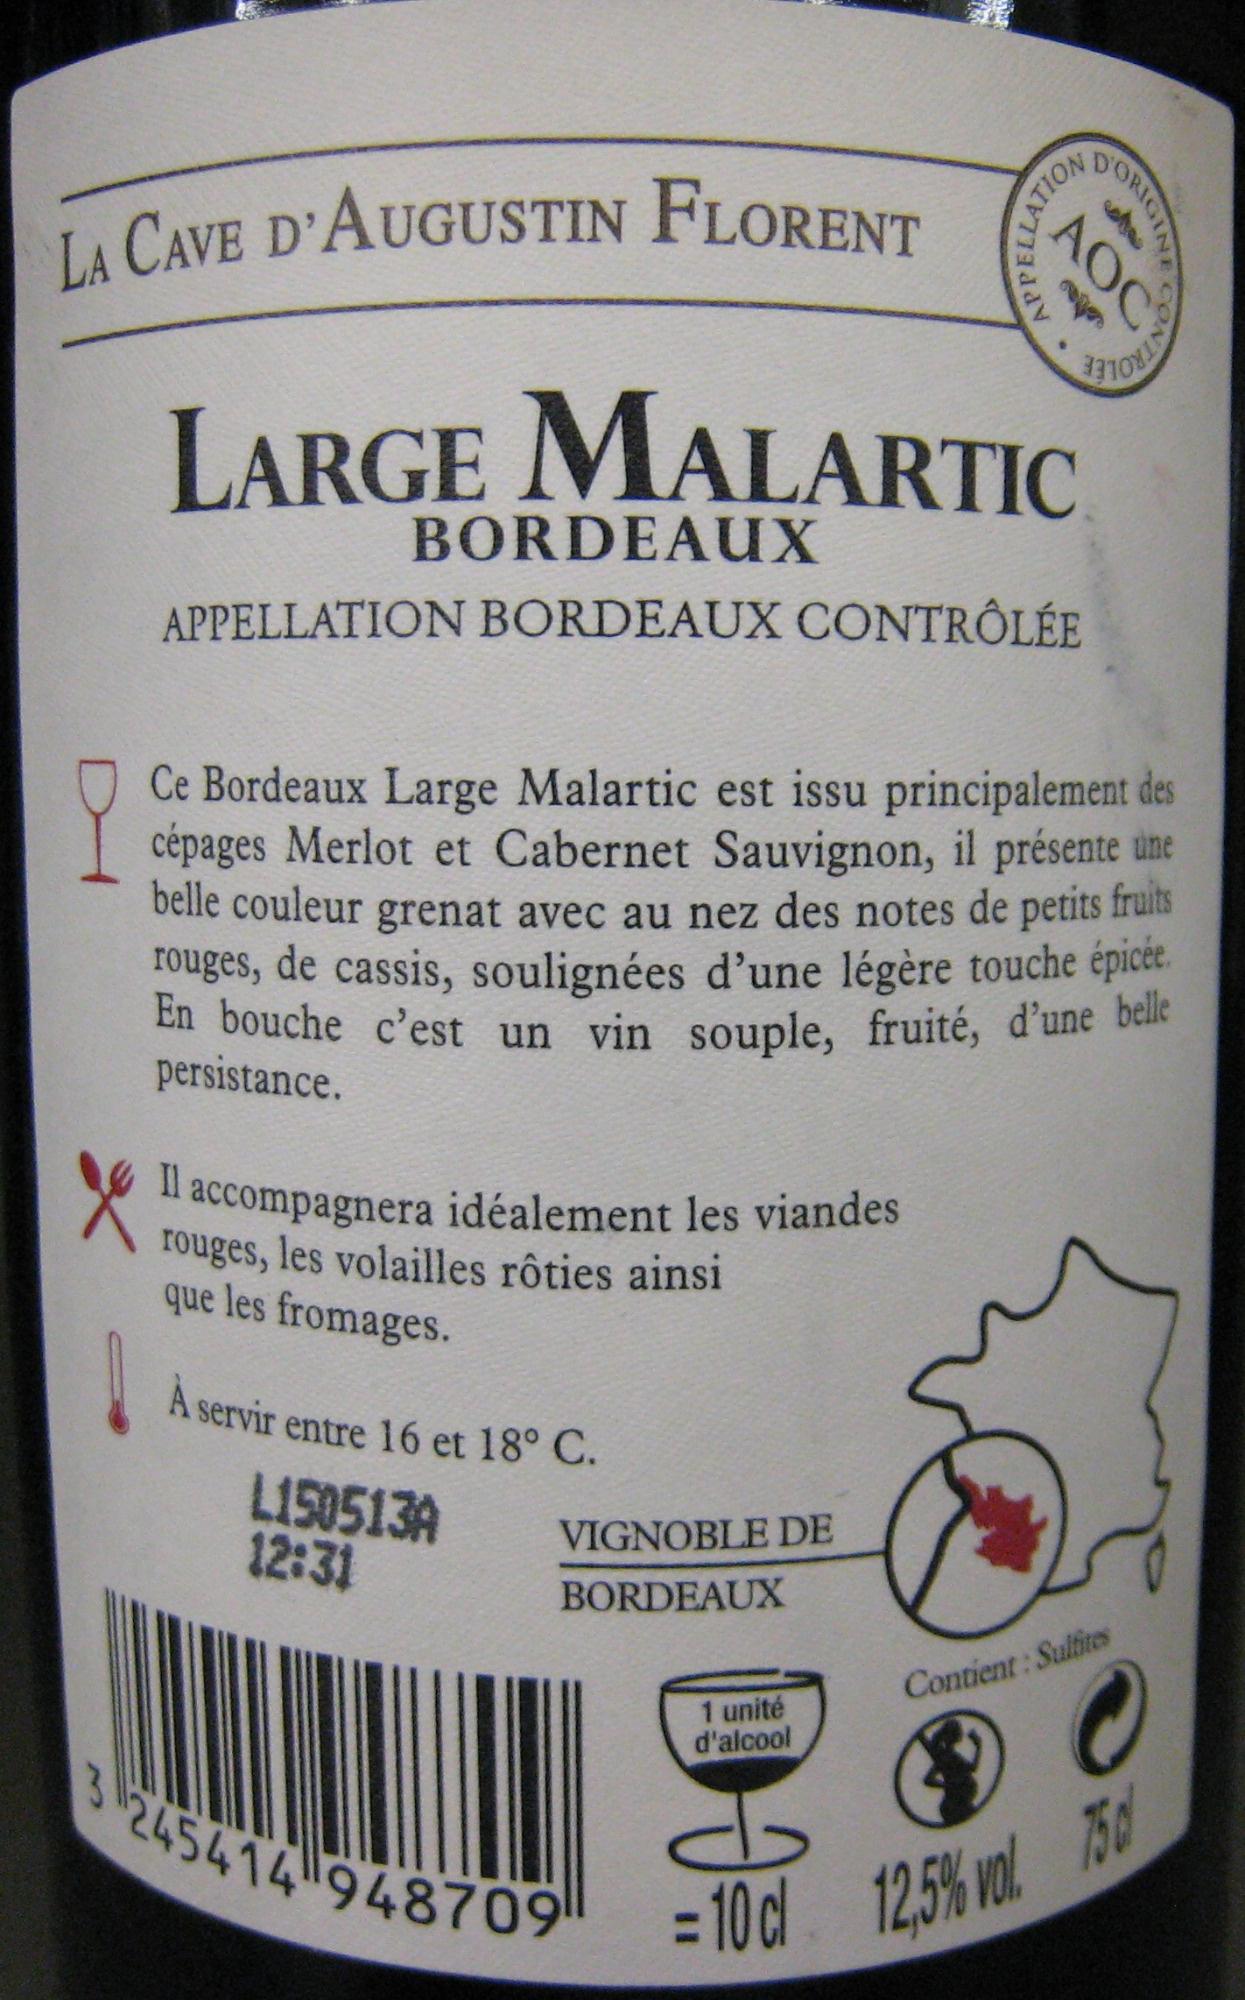 Bordeaux AOC 2011 Bio Large Malartic - Ingredienti - fr